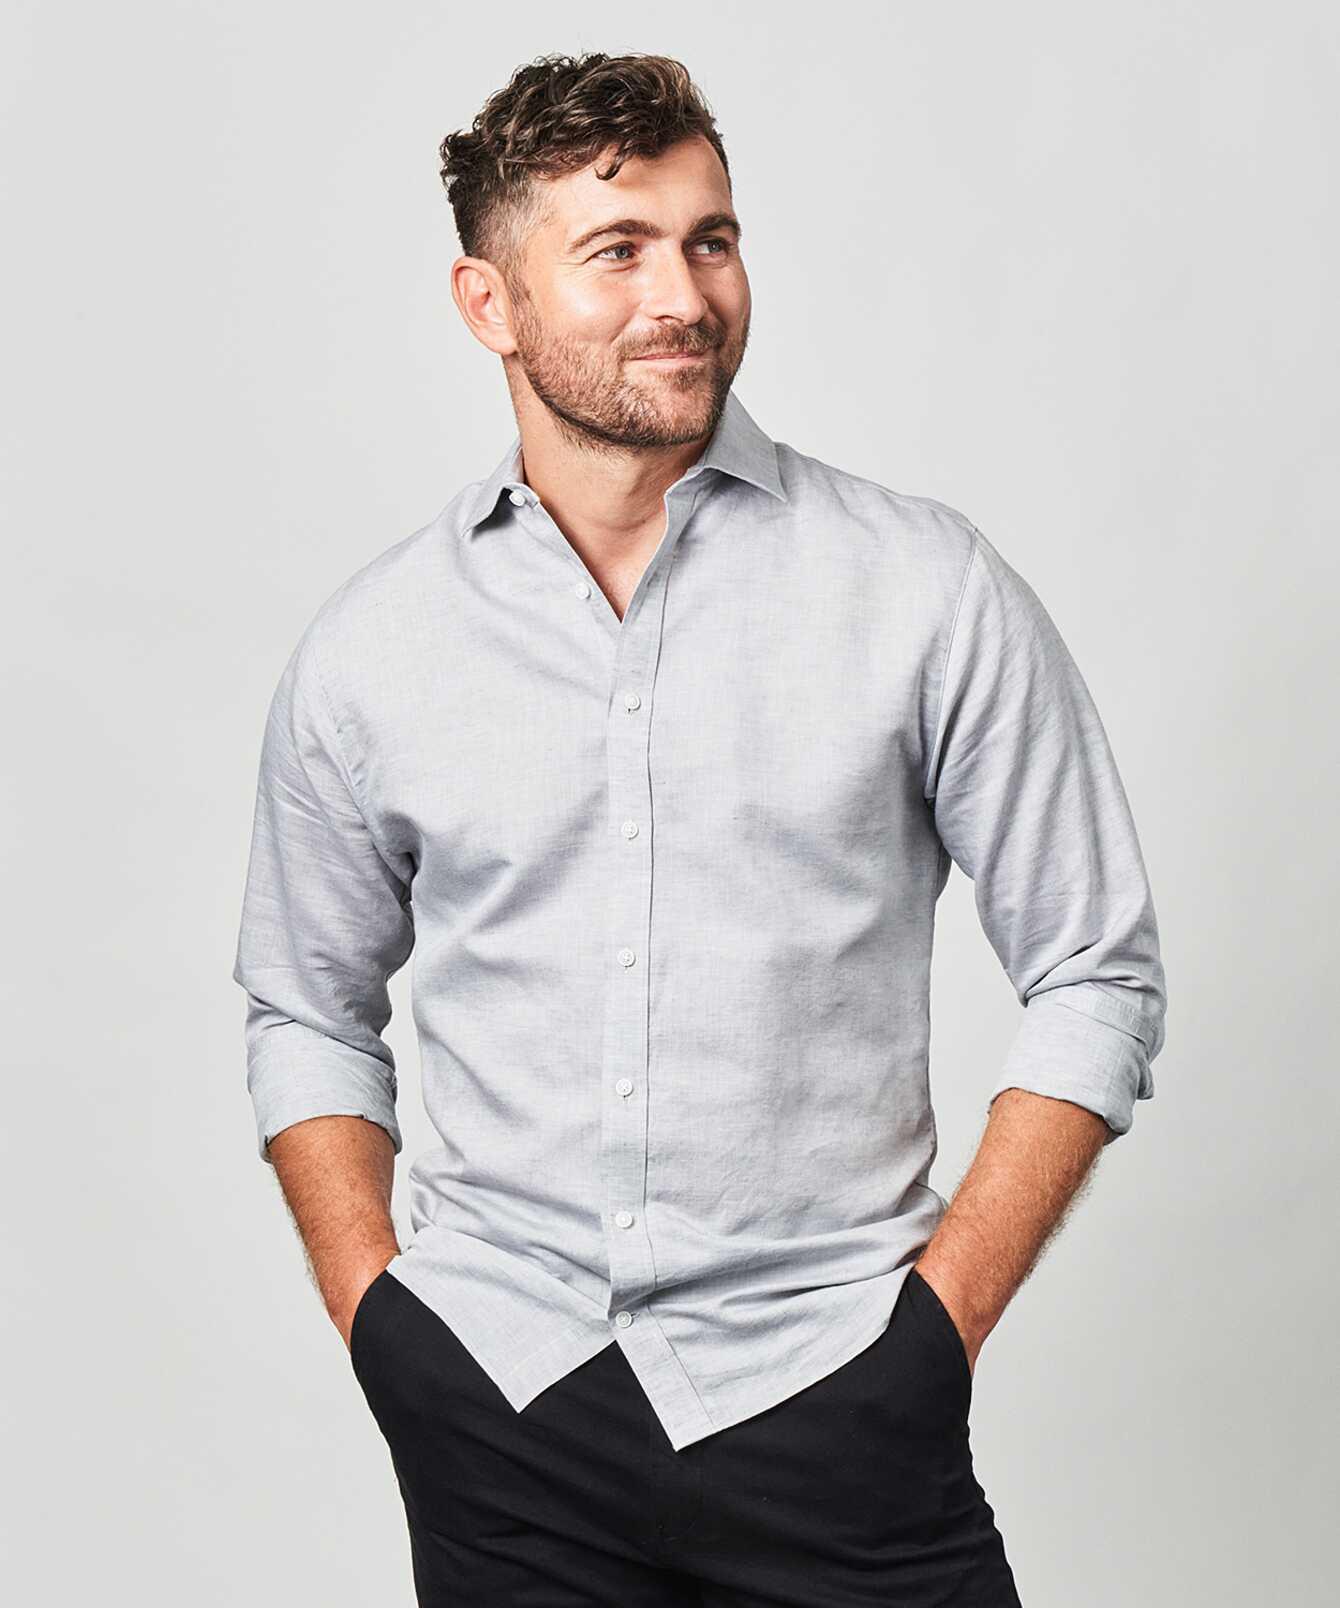 Shirt Portofino Linen Grey The Shirt Factory